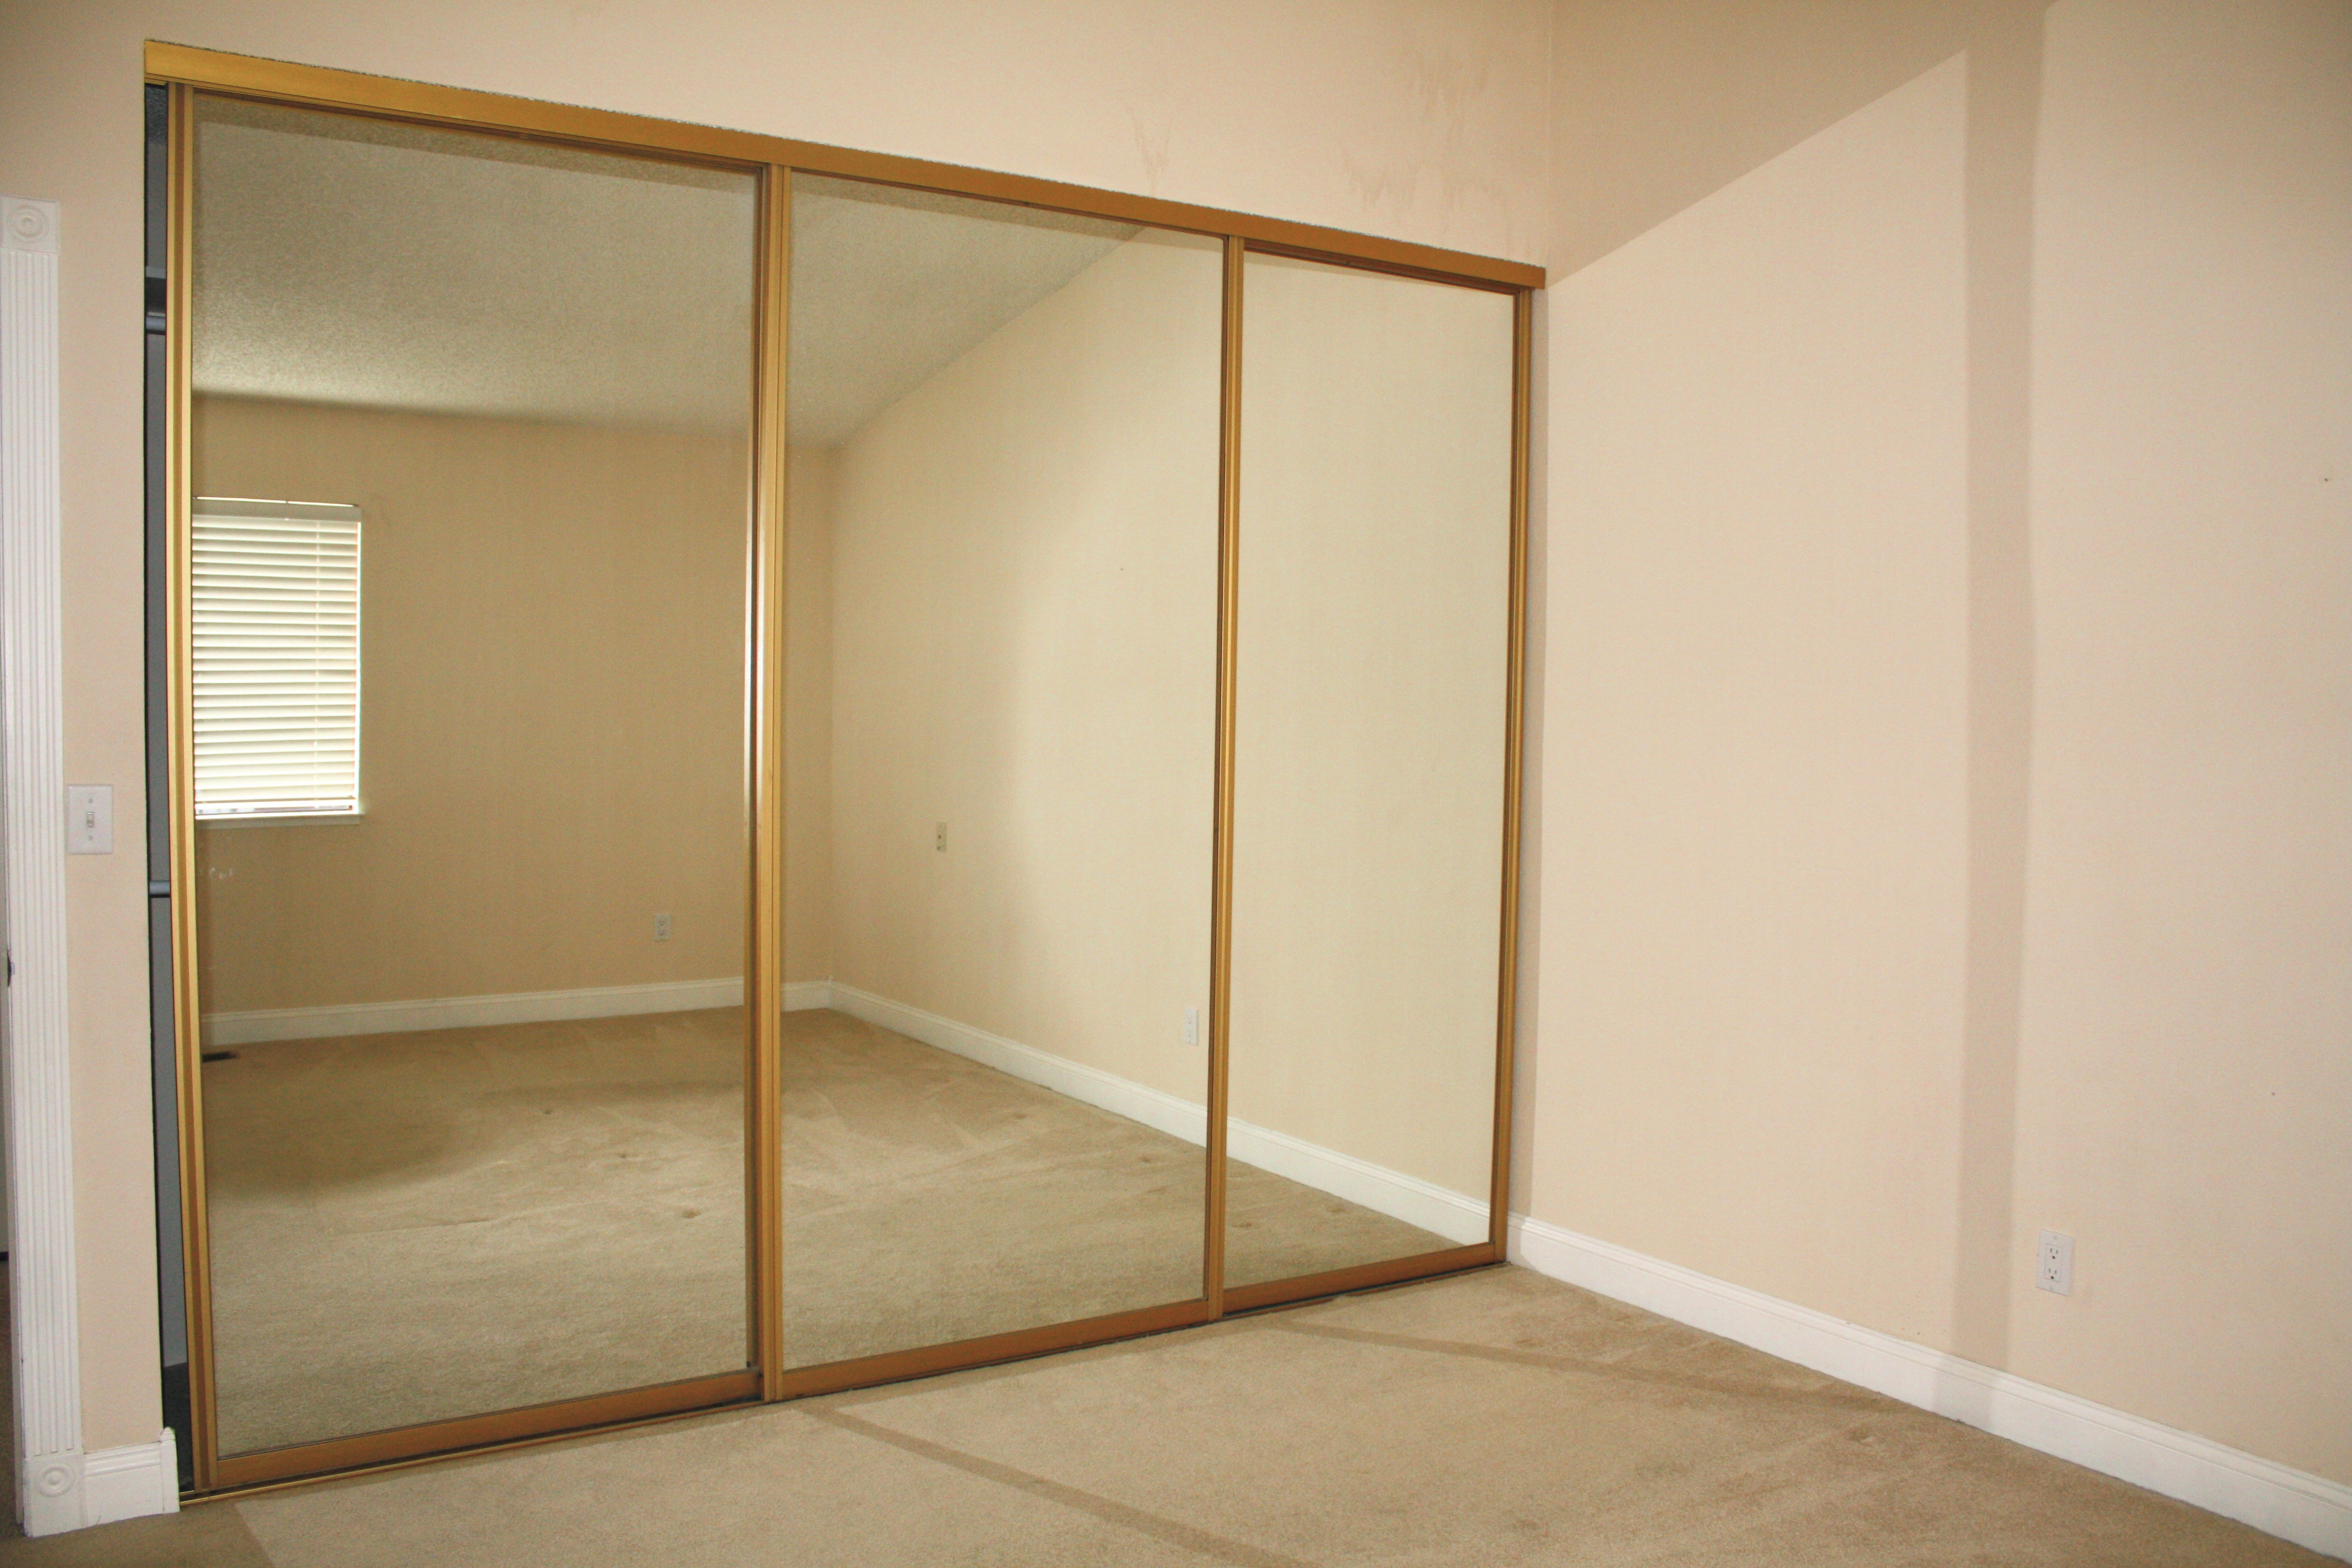 door doors choice mirror mirrored some types closet for sliding bedrooms adeltmechanical ideas